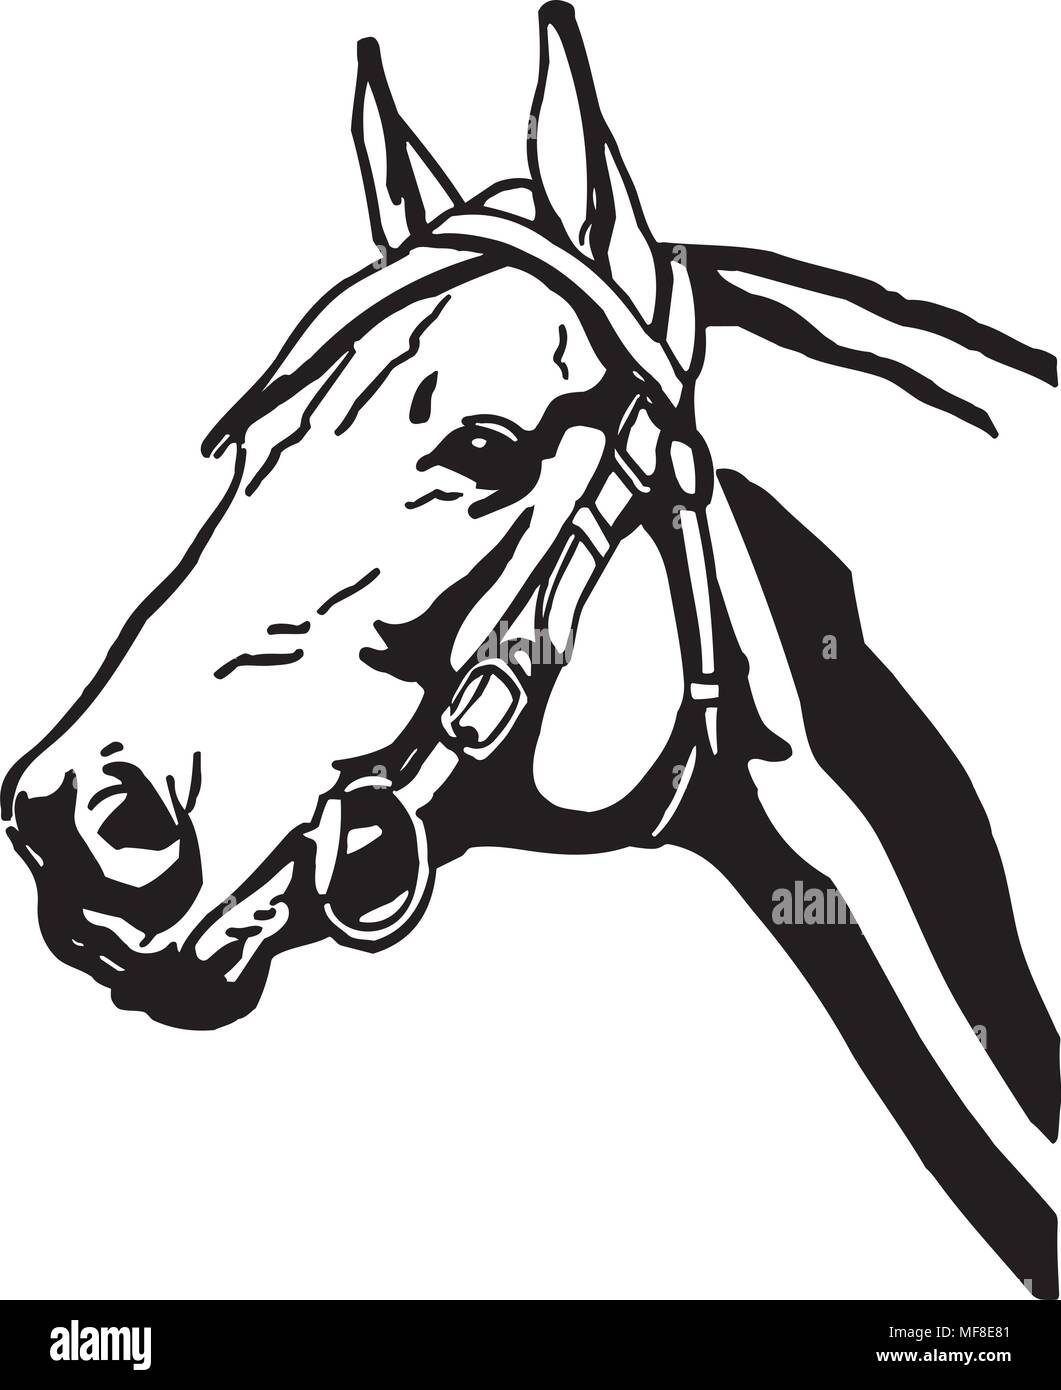 Horsehead 2 Retro Ilustracion Clipart Imagen Vector De Stock Alamy